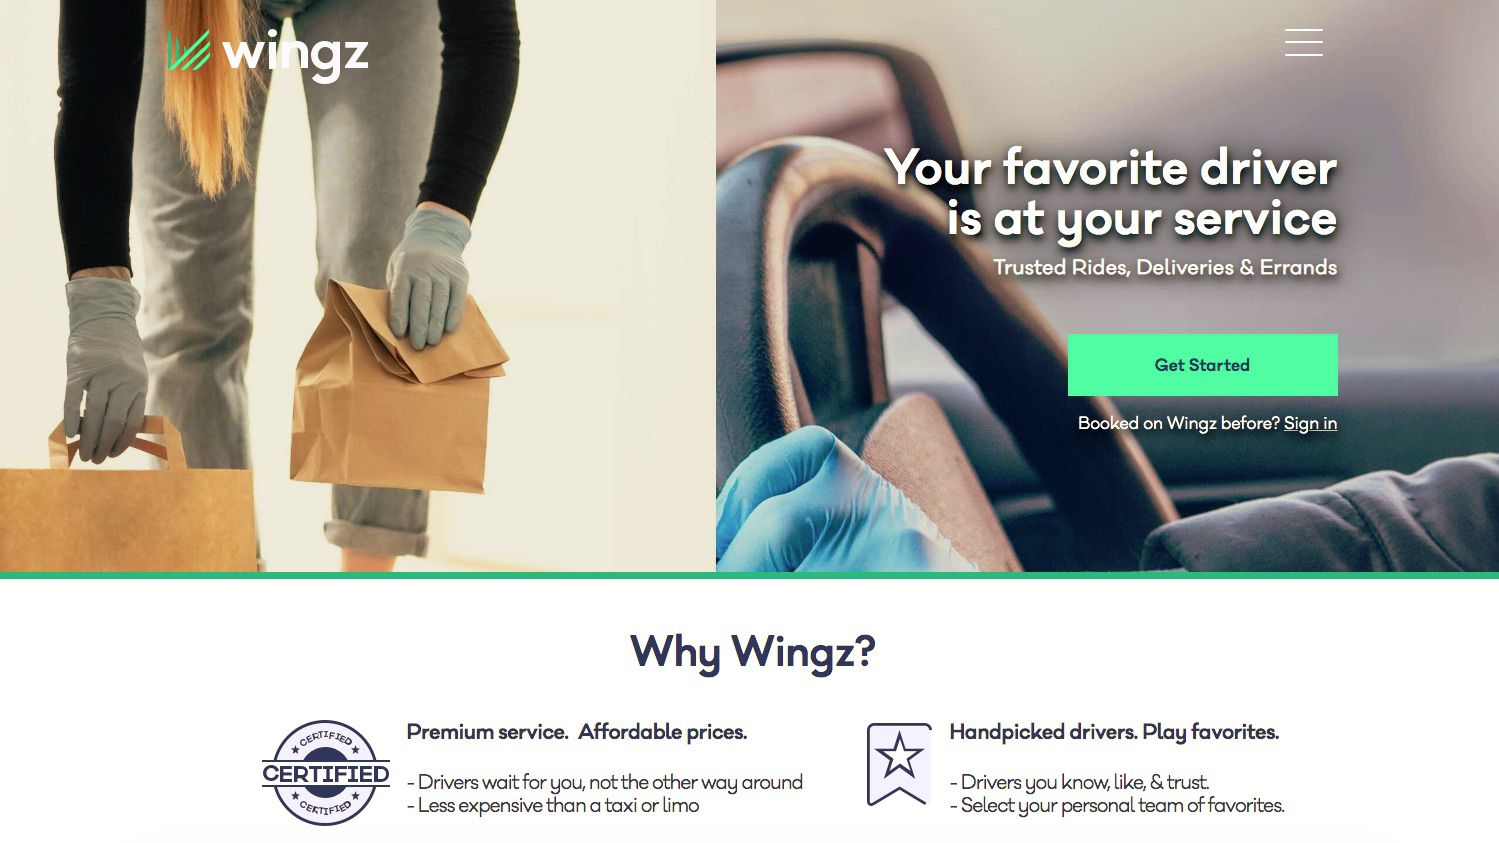 Wingz ridesharing service